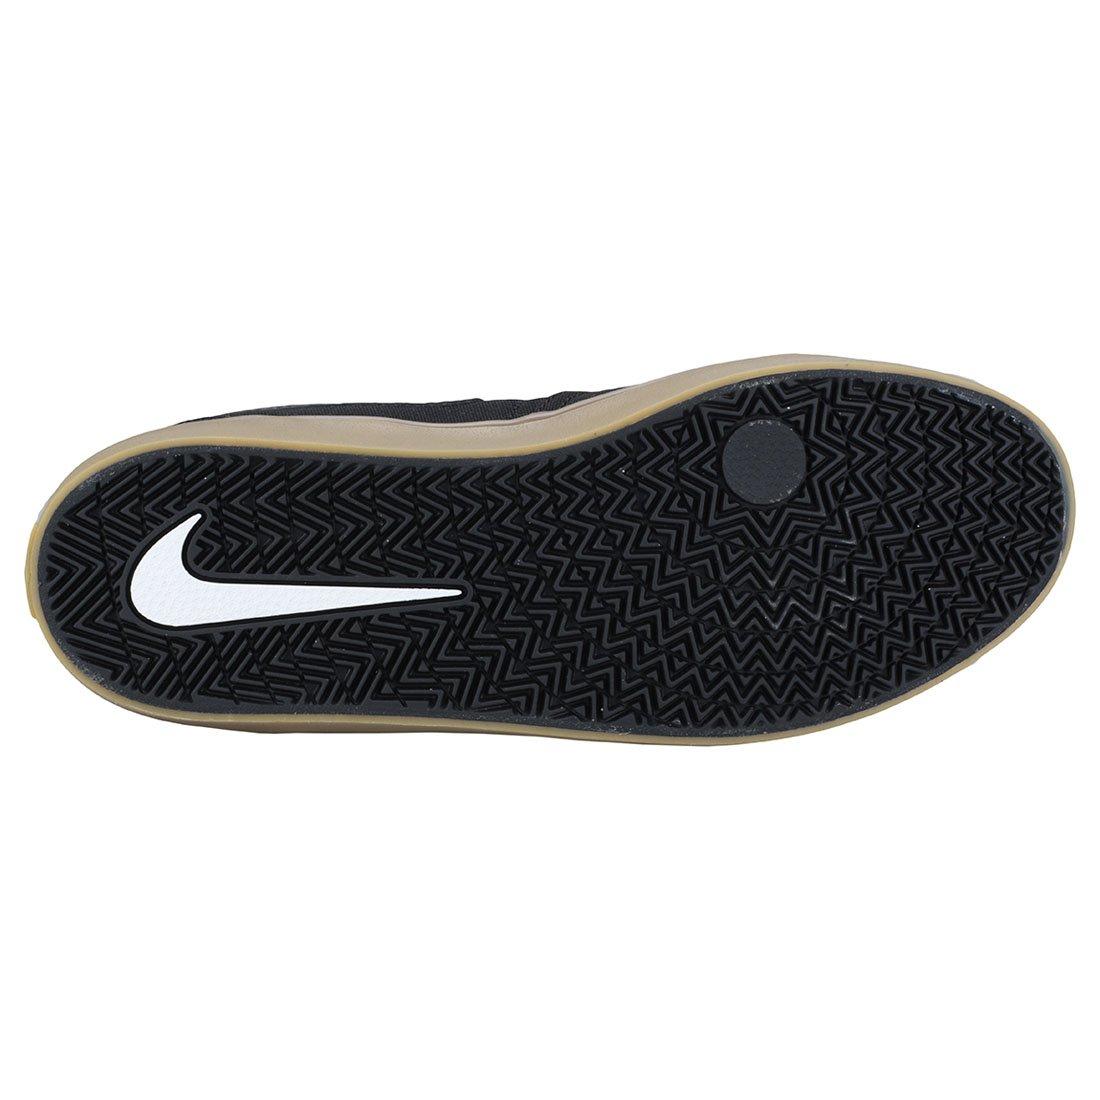 Nike Men's SB Check Solarsoft Canvas Skateboarding Shoes Black/Black-Gum Light Brown 10 by Nike (Image #7)